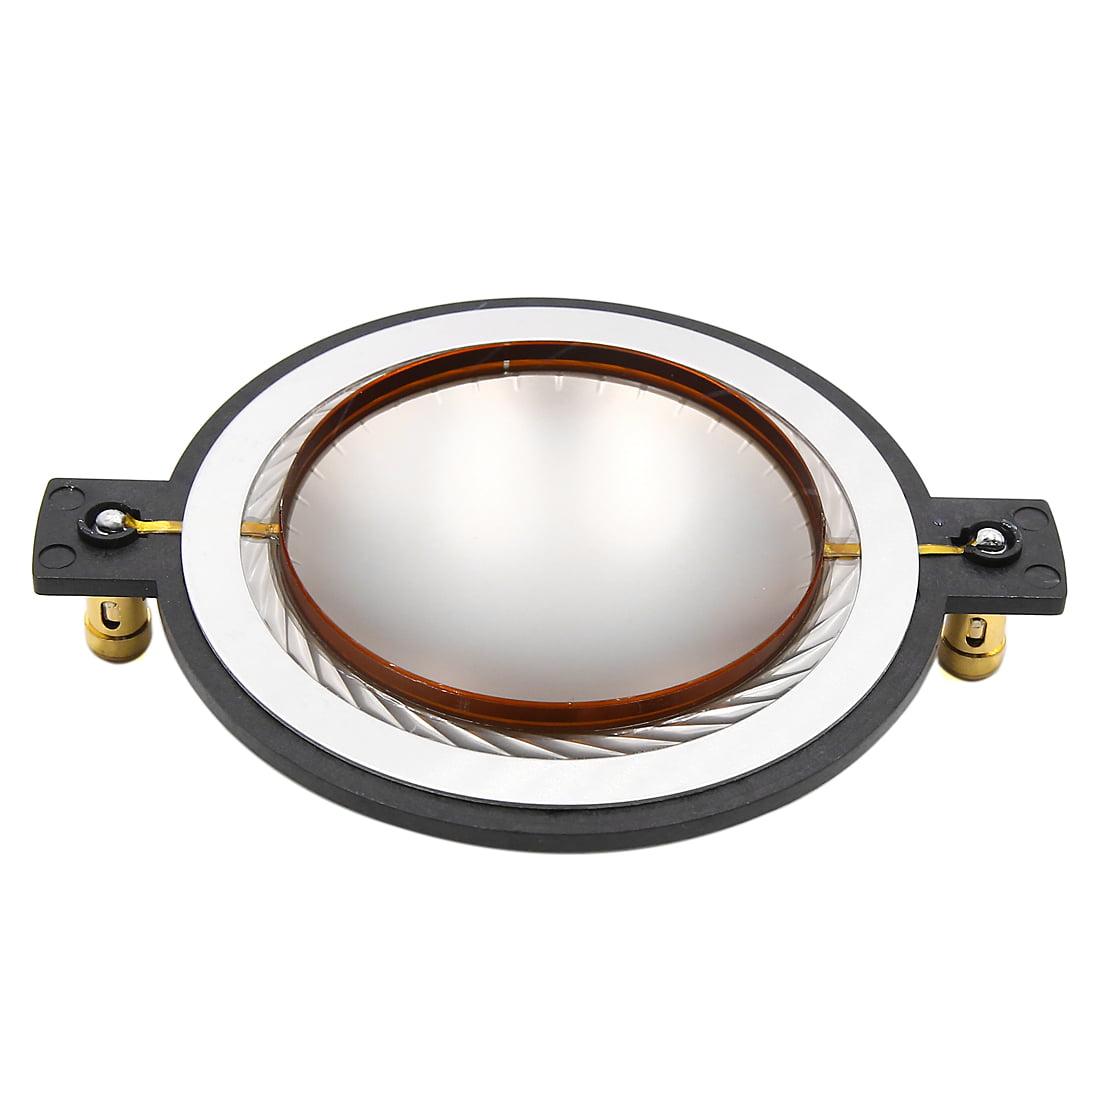 74.5mm Sound Speaker Diaphragm Car Voice Coil Replacement w Copper Pillar